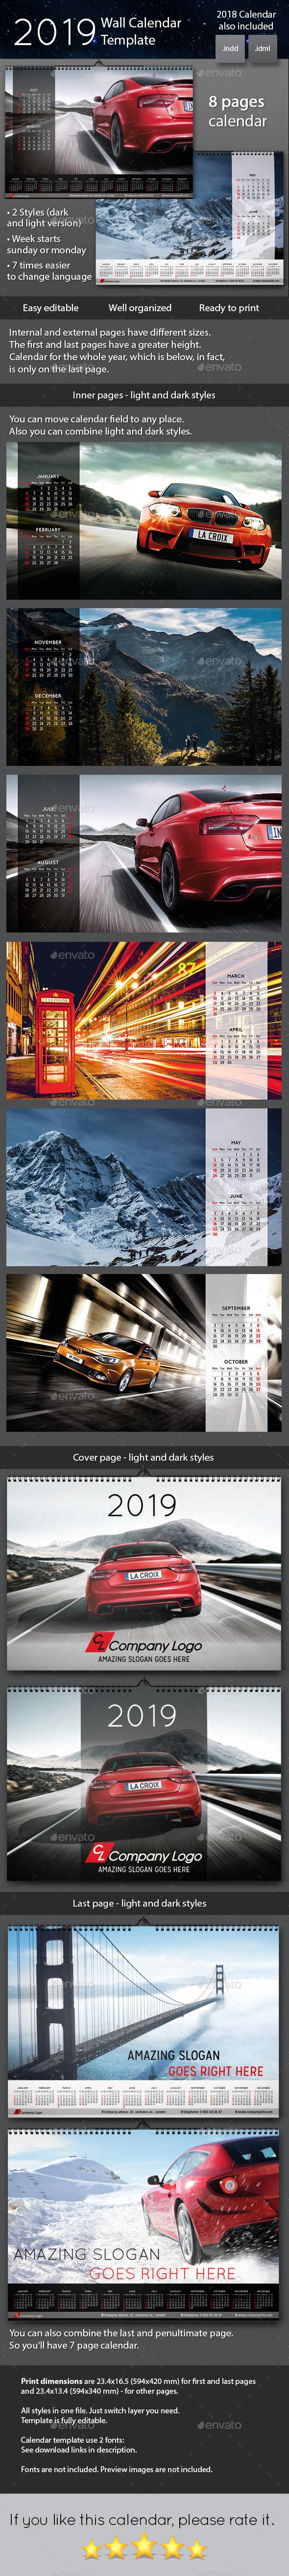 2019 Wall Calendar - Calendars Stationery